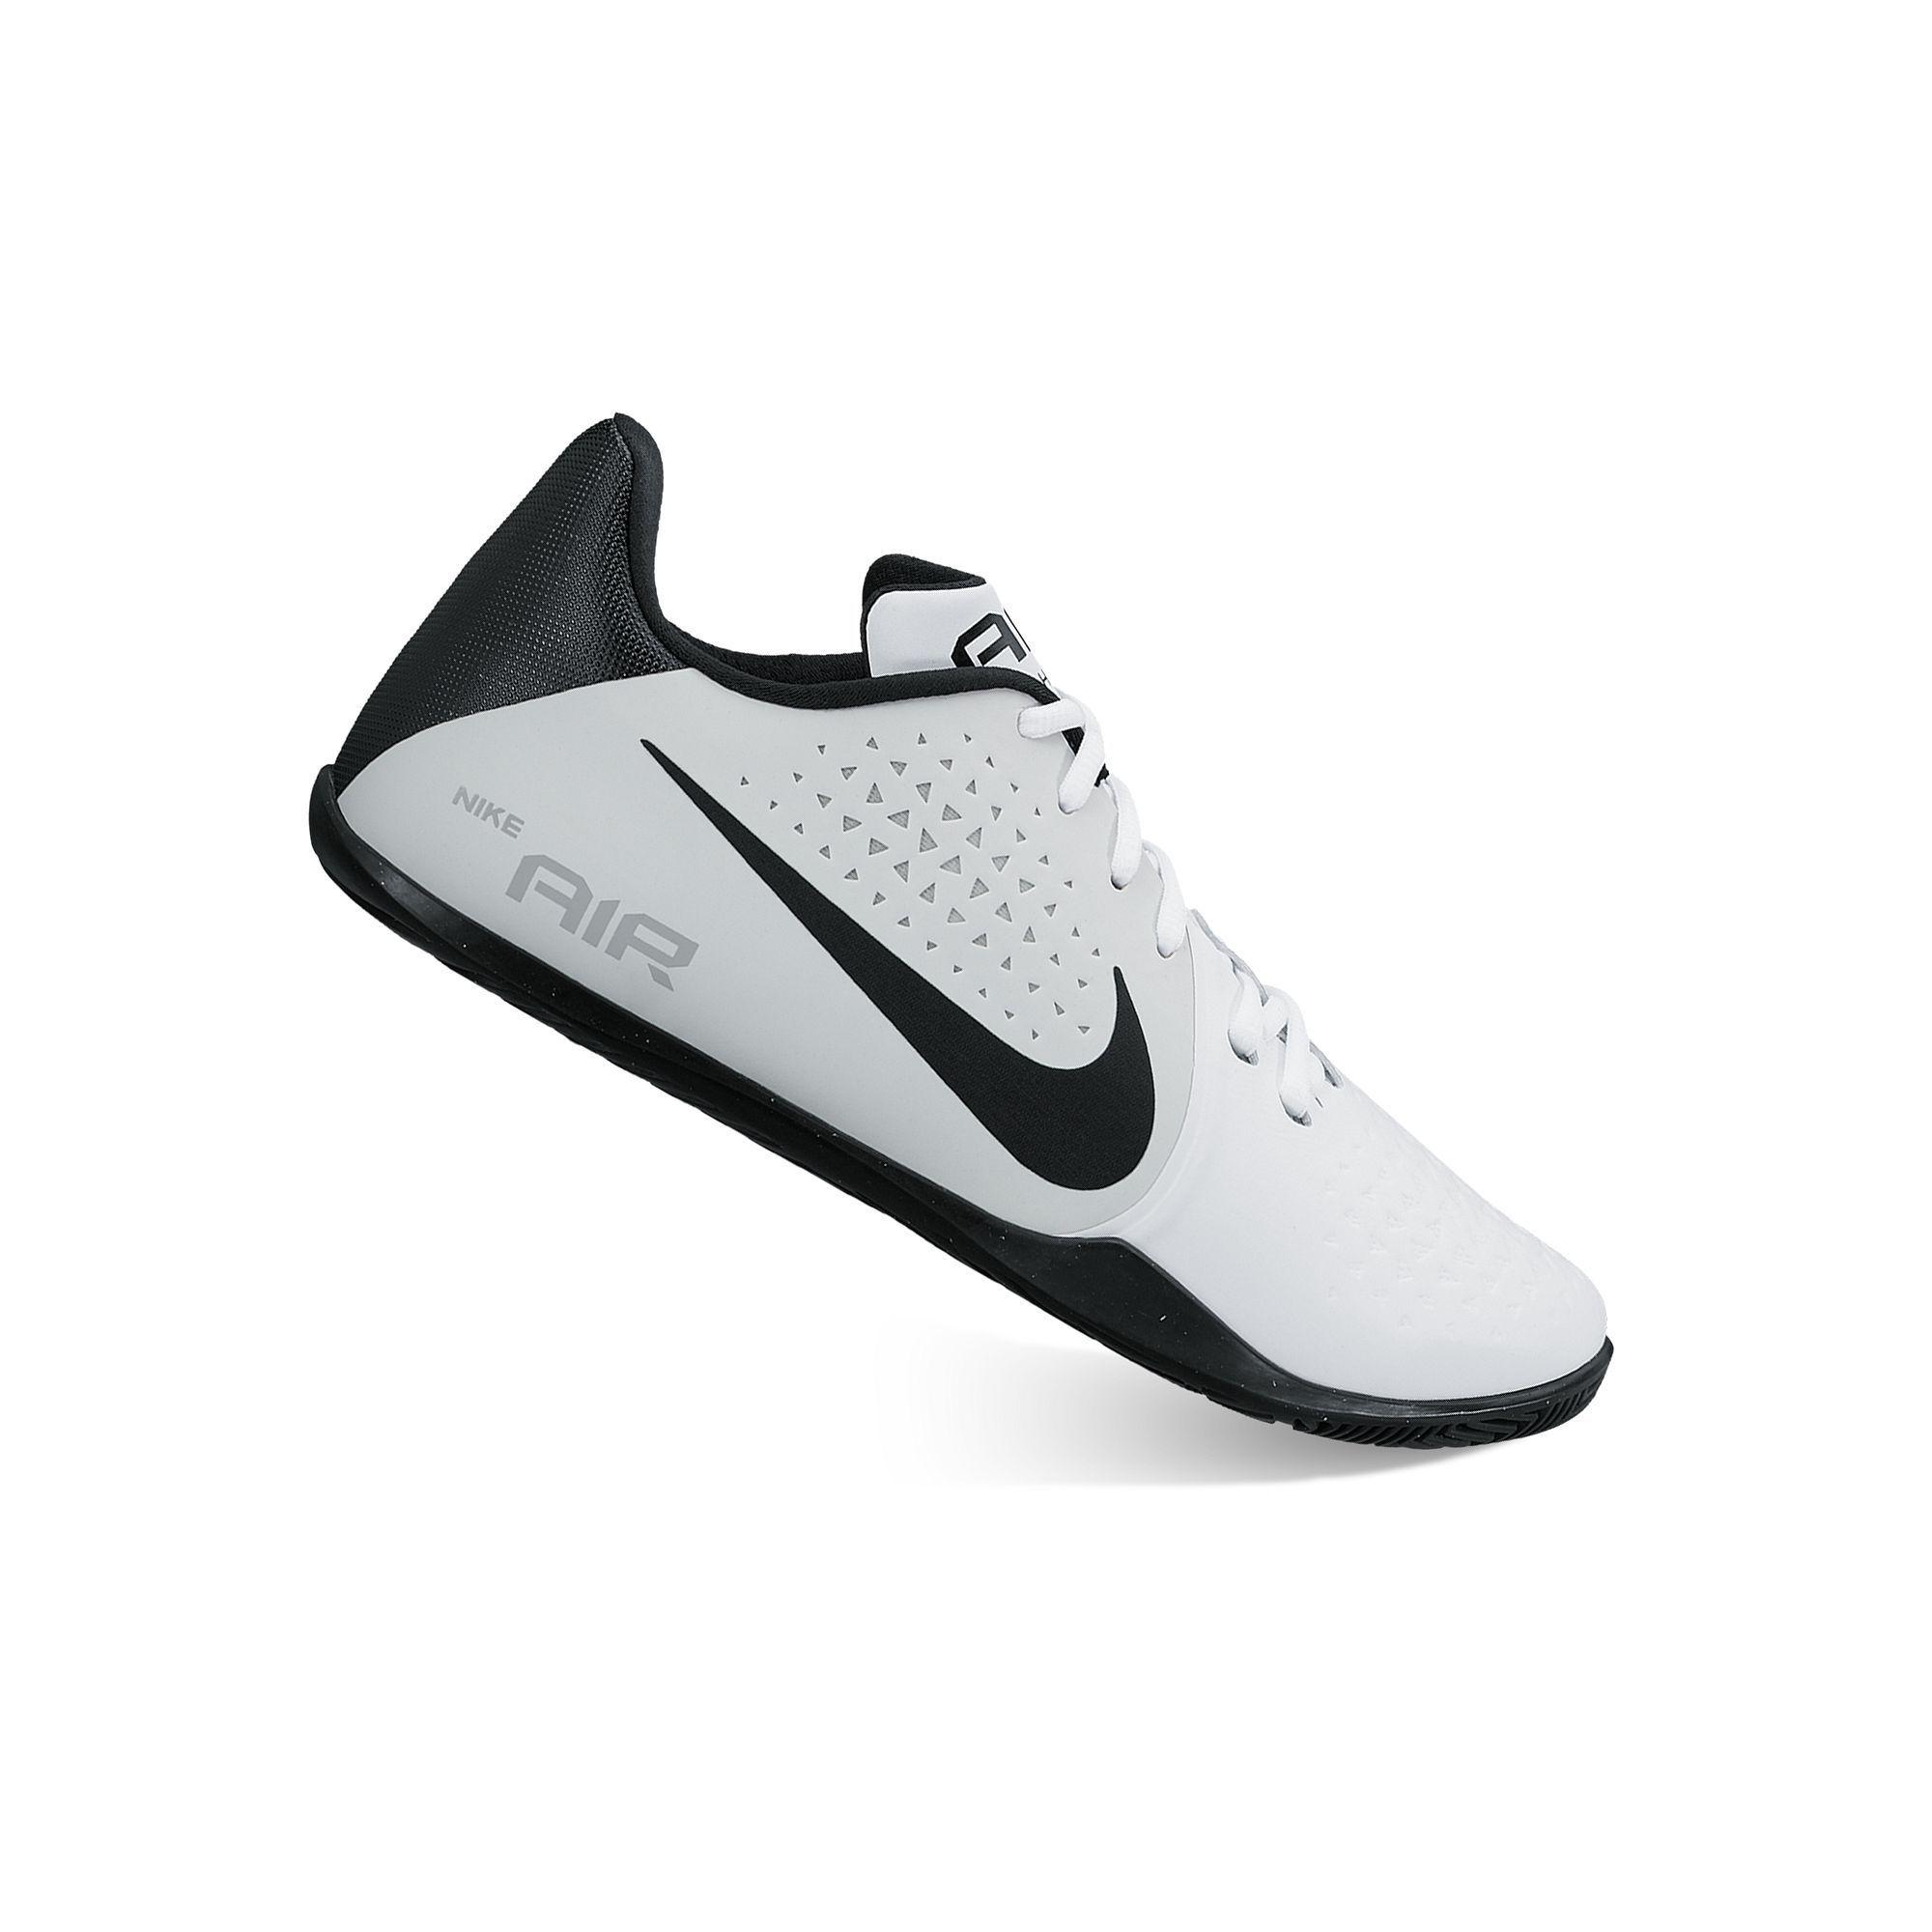 air jordan shoes size 10 5 convert mm to ft 748462